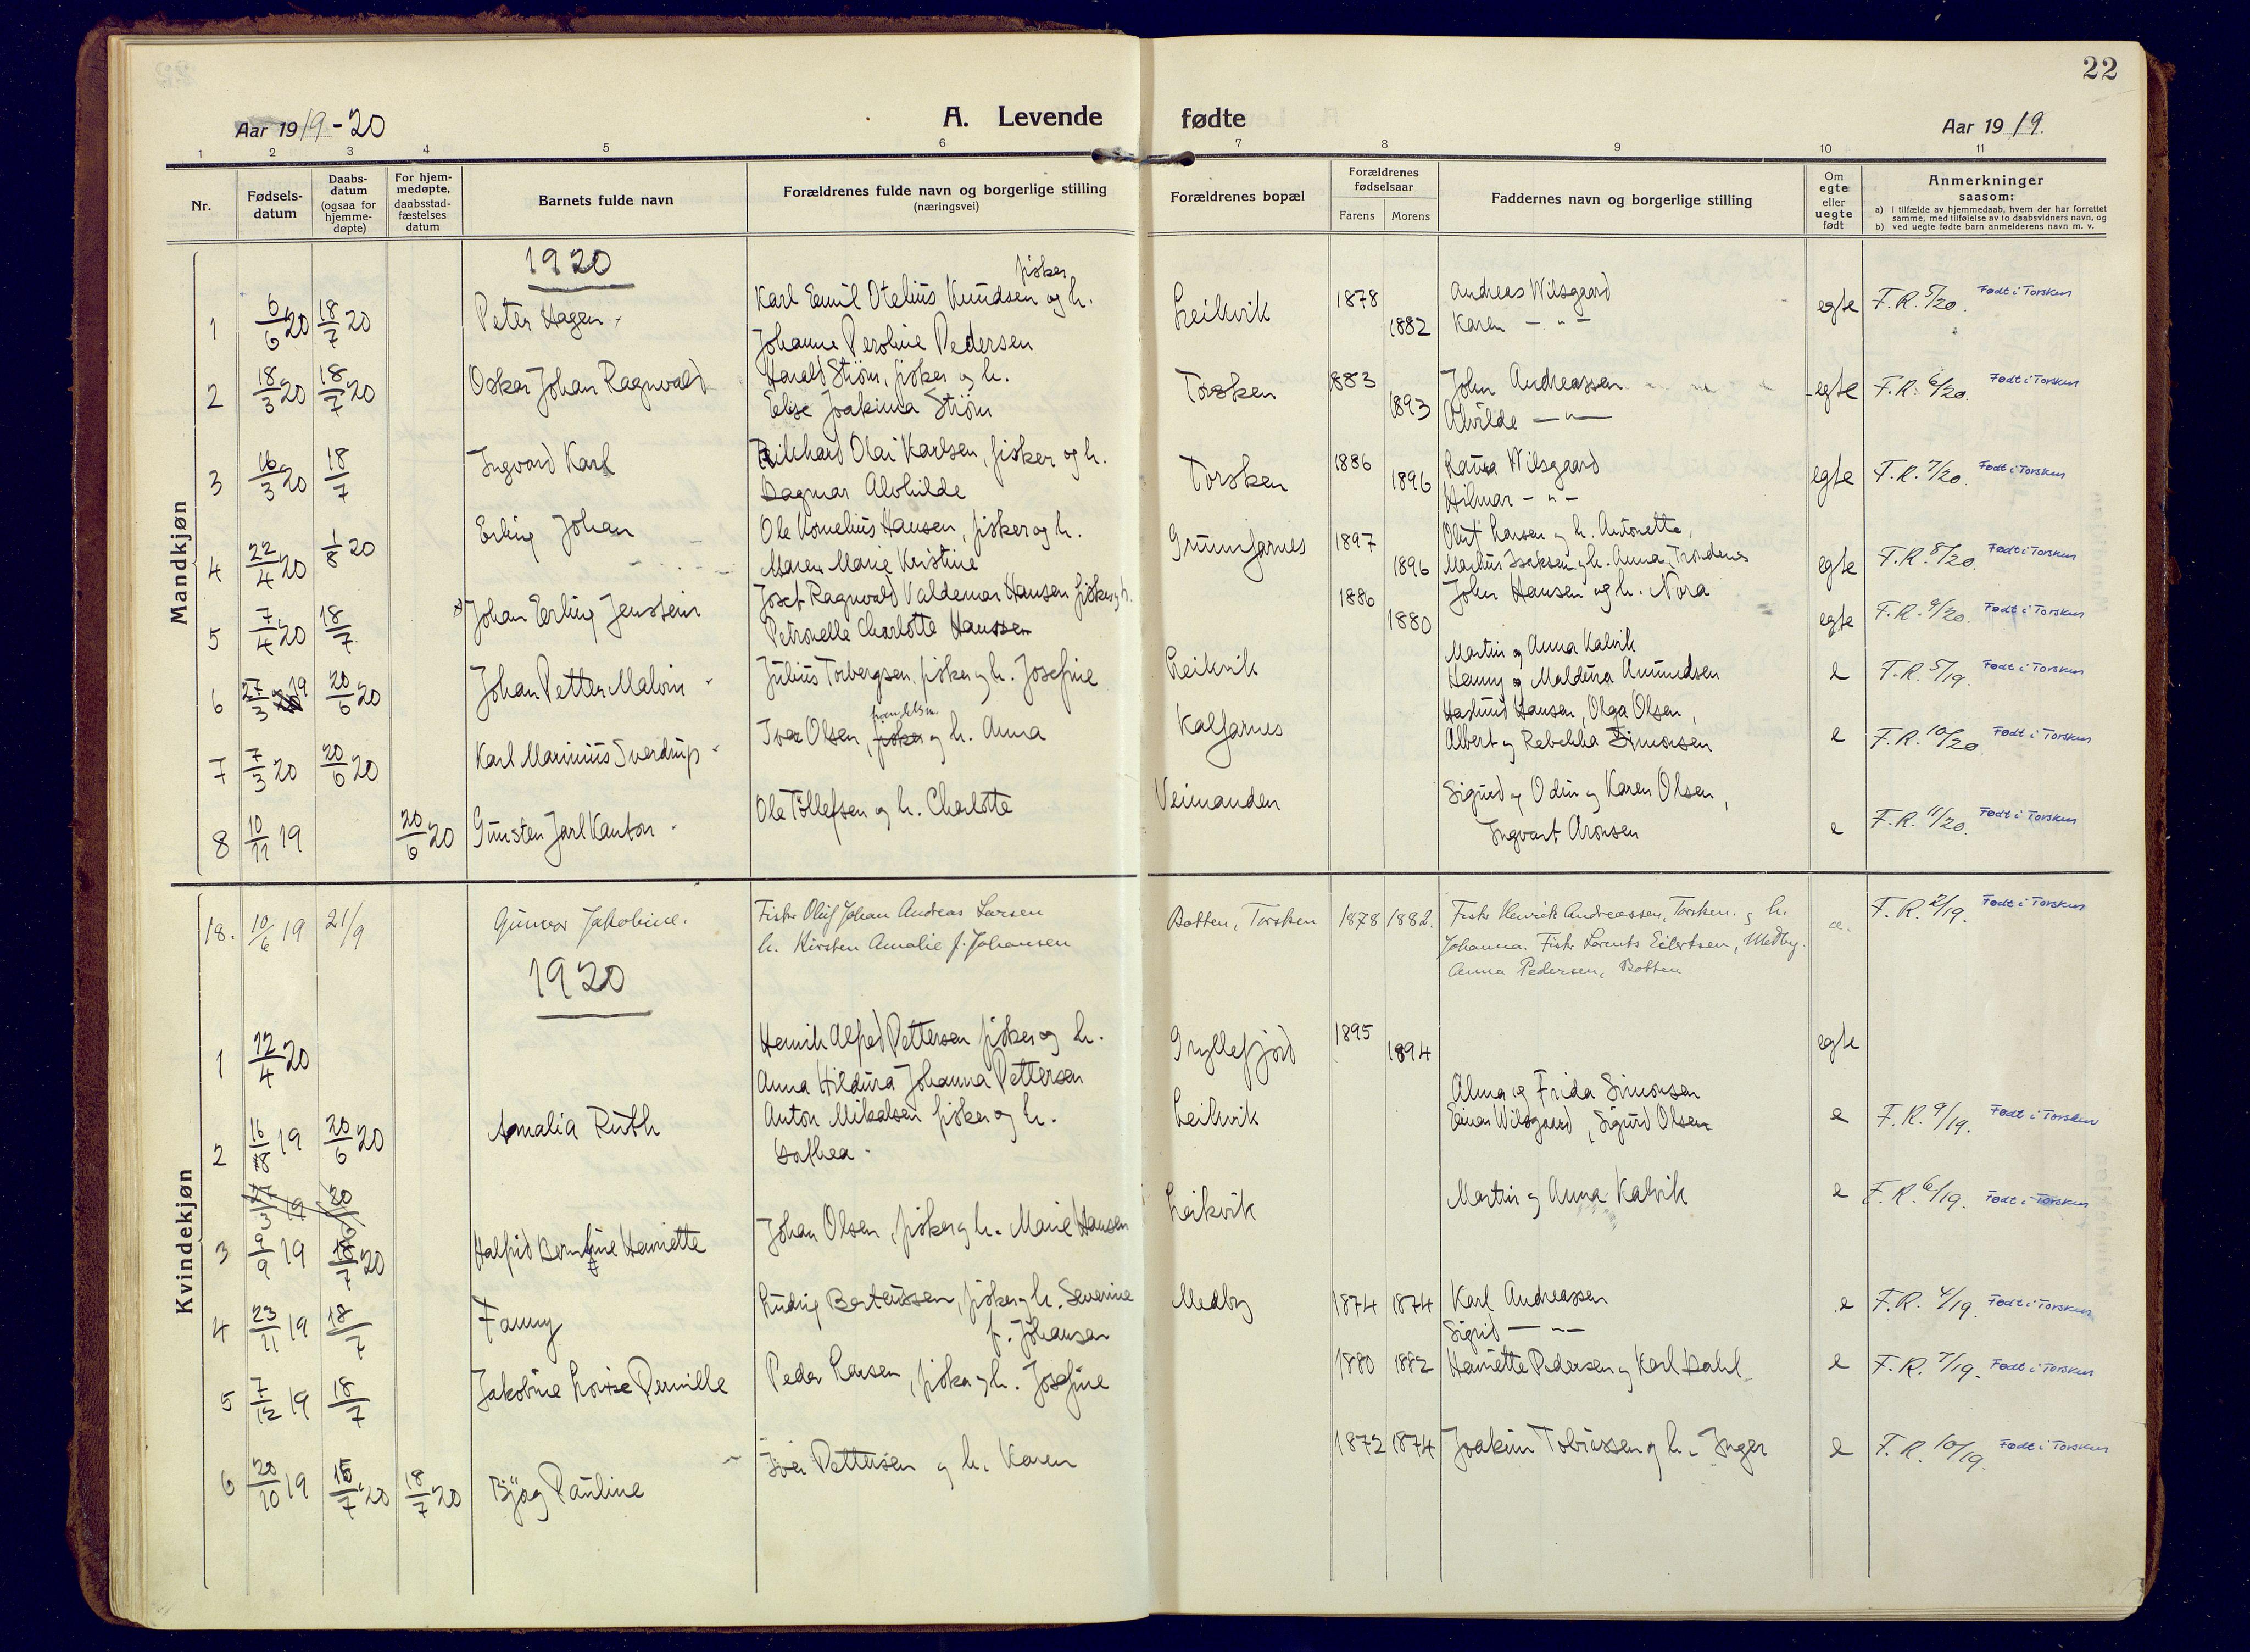 SATØ, Mefjord/Berg sokneprestkontor, G/Ga/Gaa: Ministerialbok nr. 10, 1916-1928, s. 22